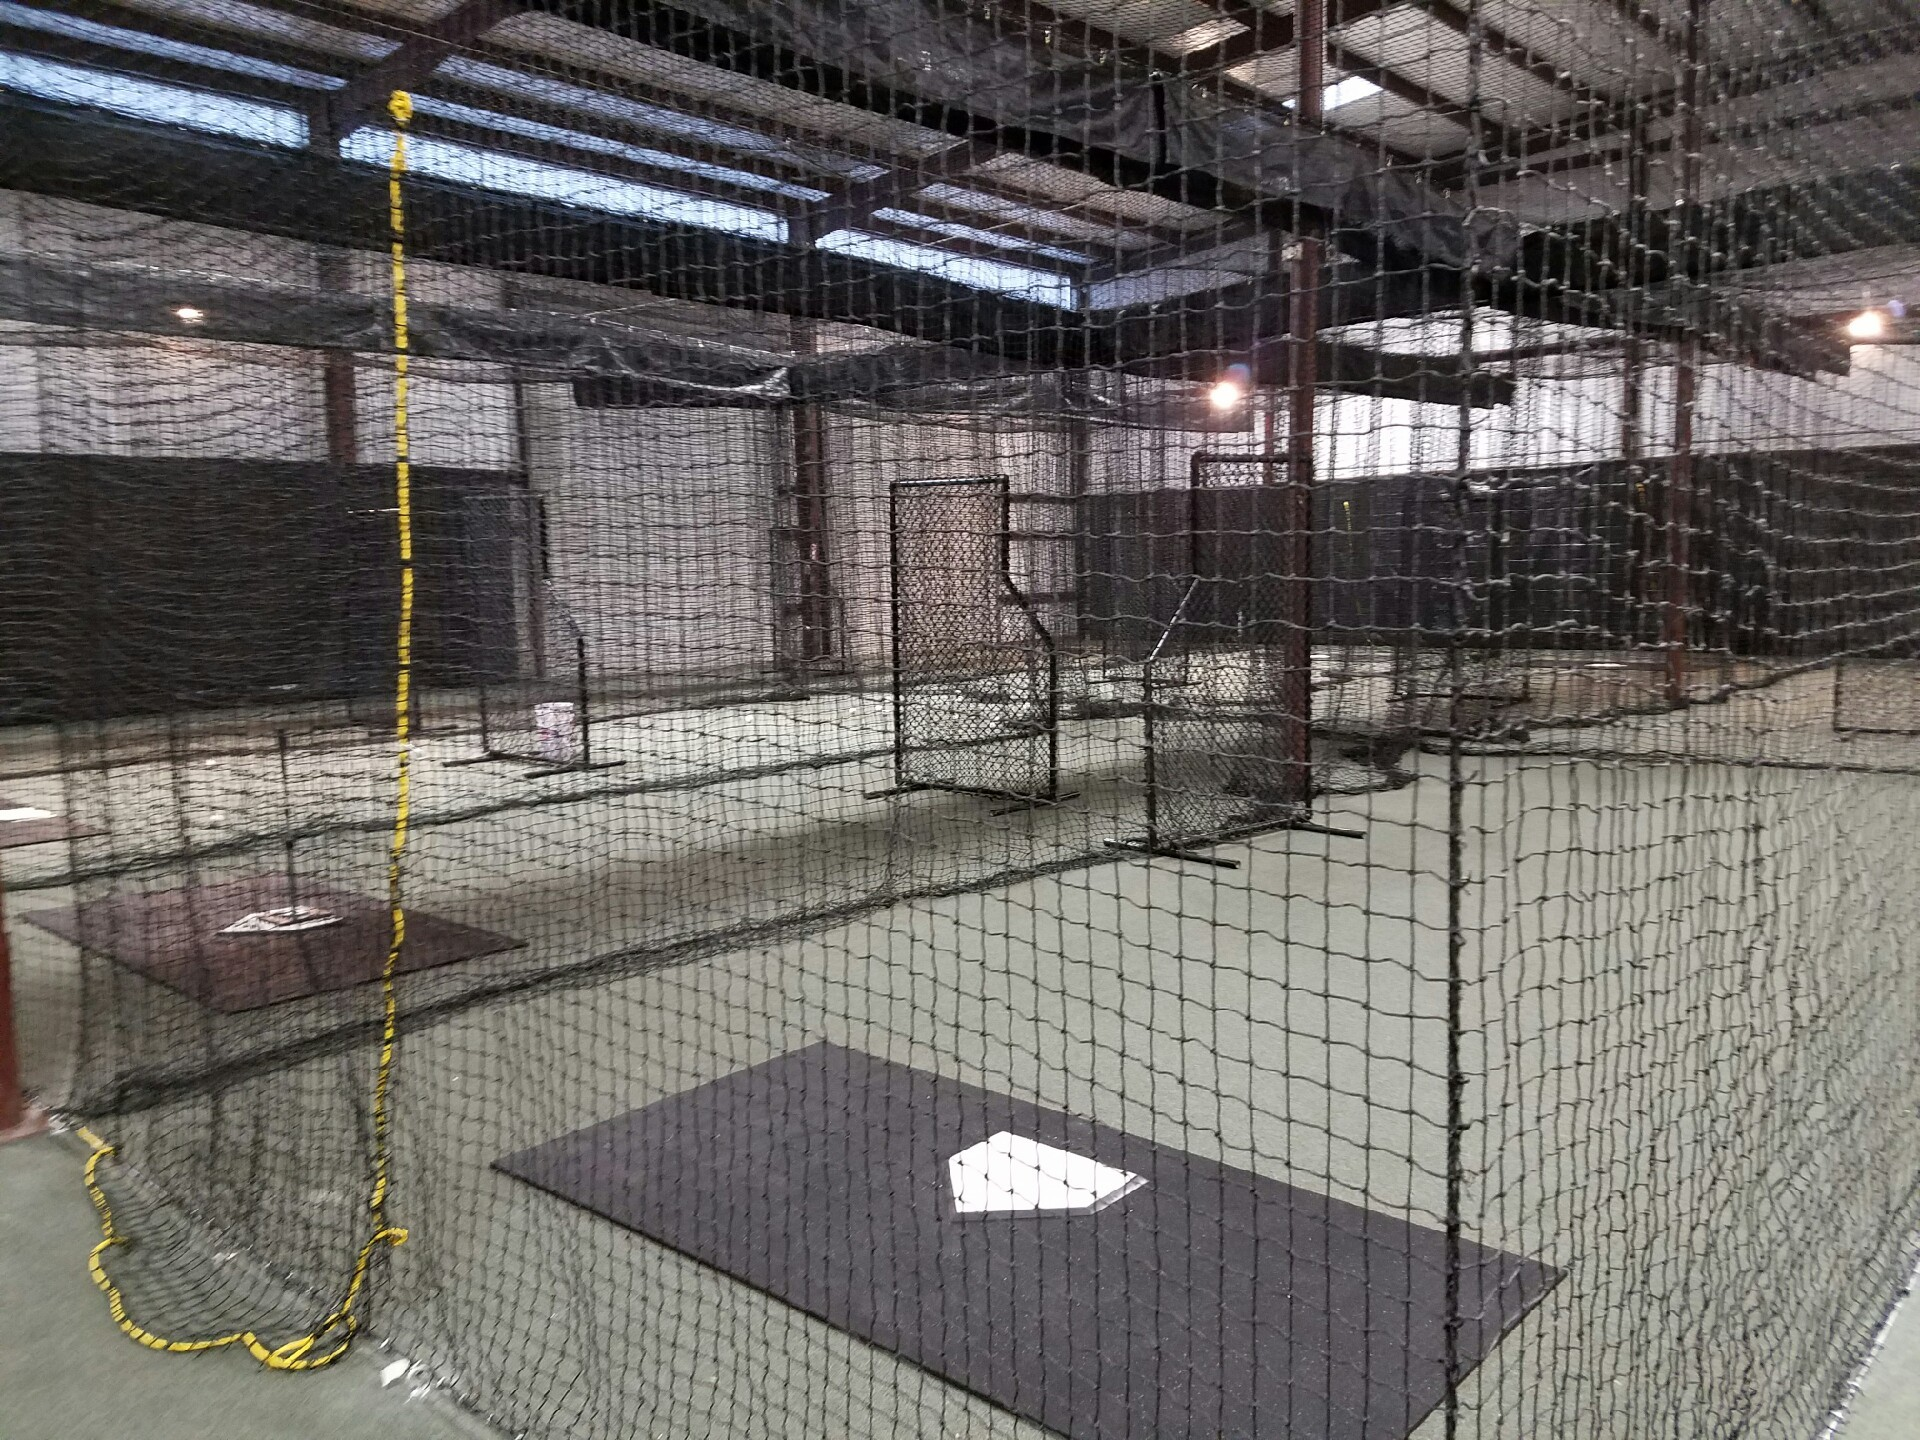 Cage Rentals - $40 per hr / $25 per 1/2-hr